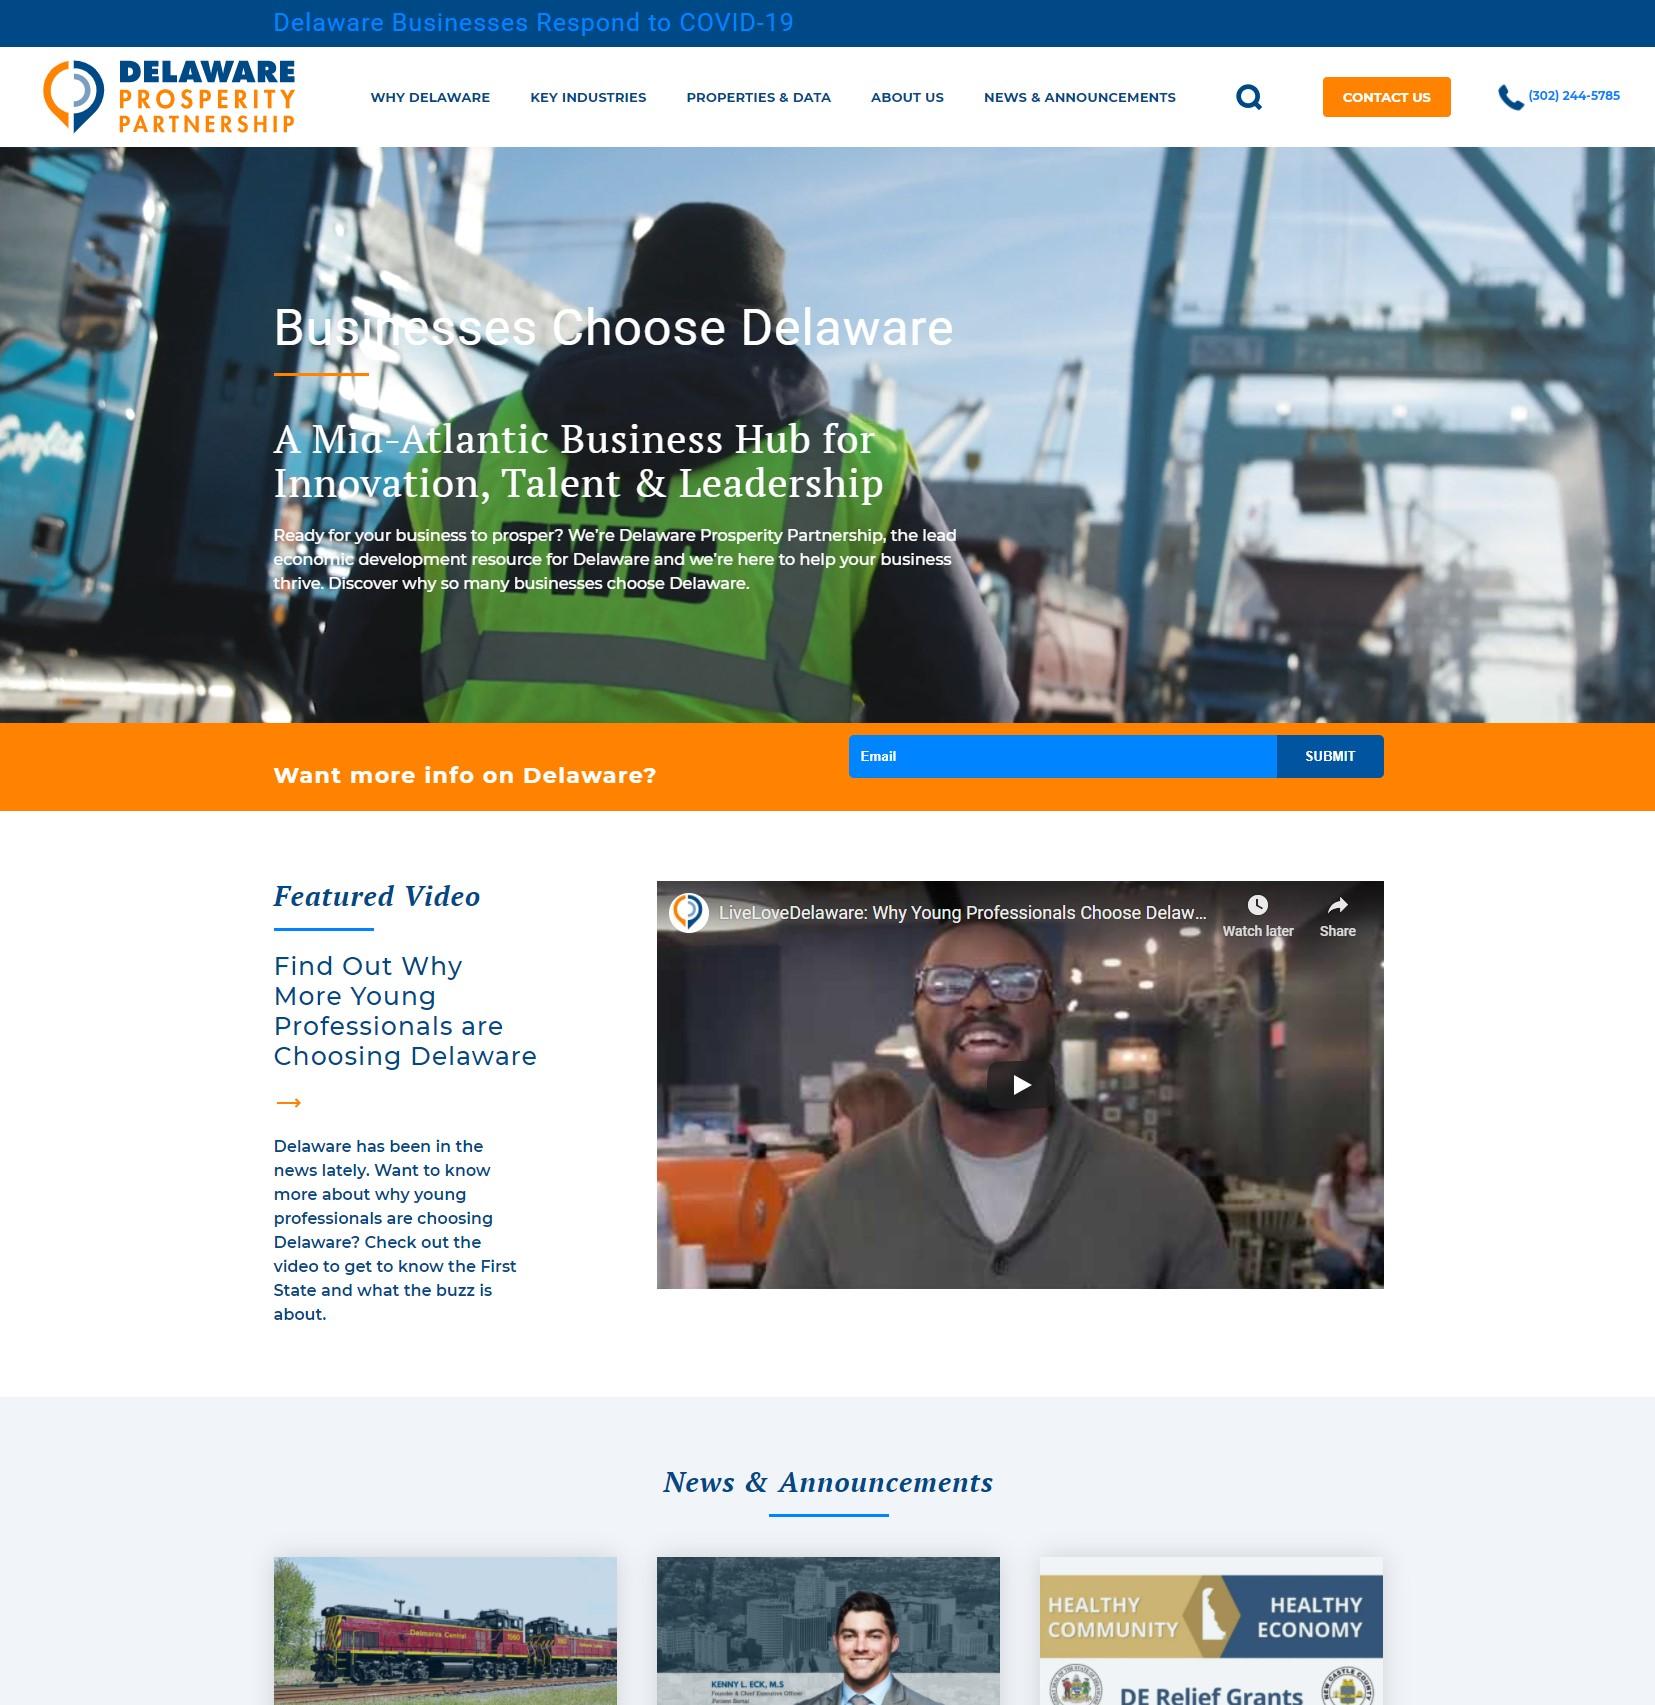 Delaware Prosperity Partnership image